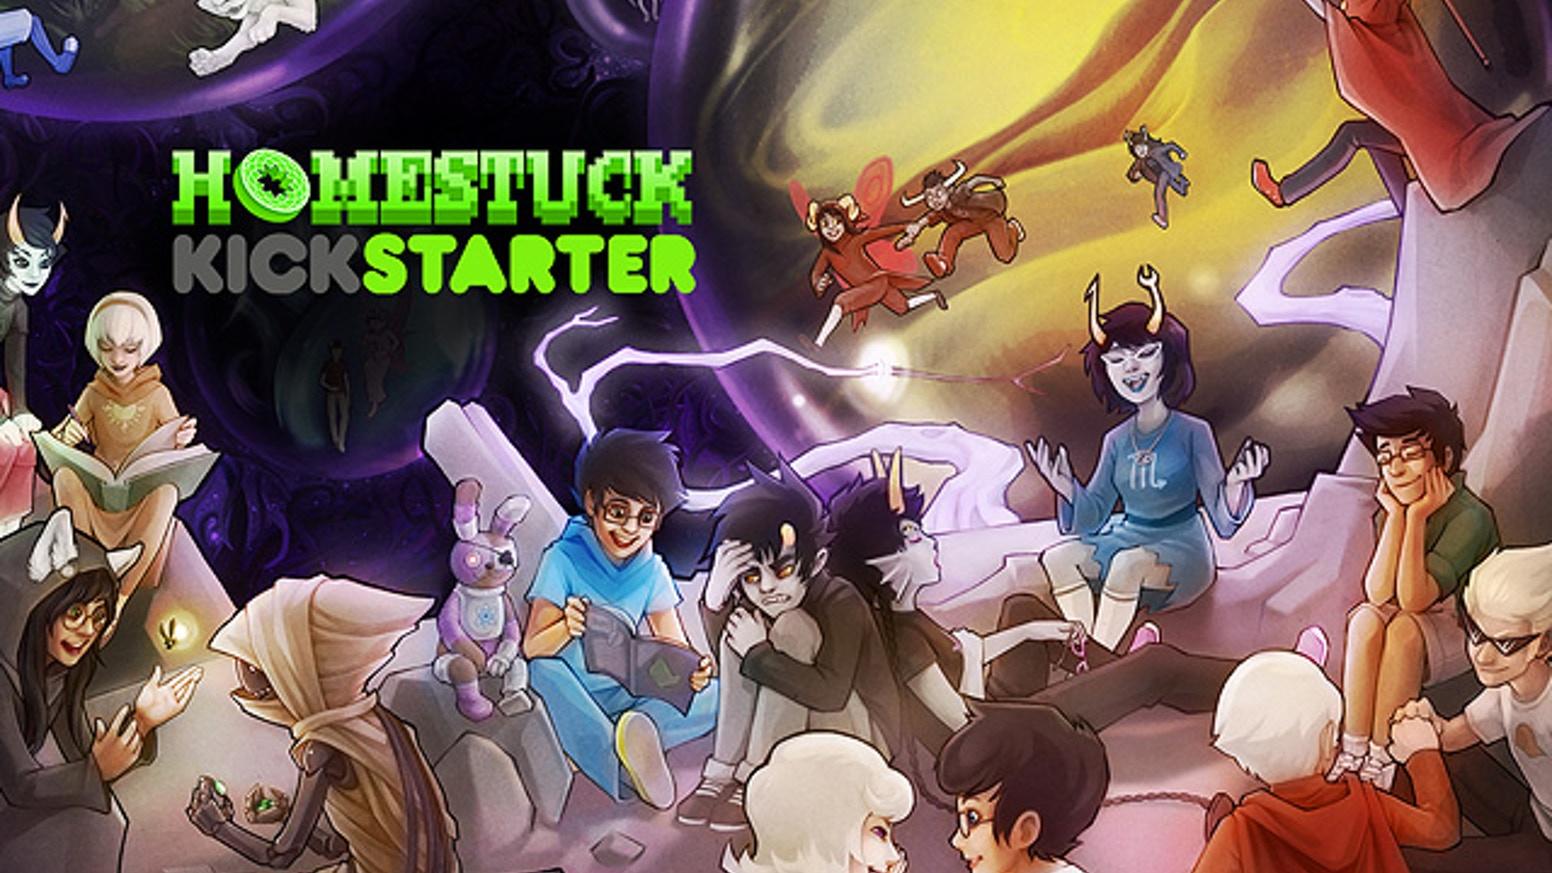 Homestuck Kickstarter